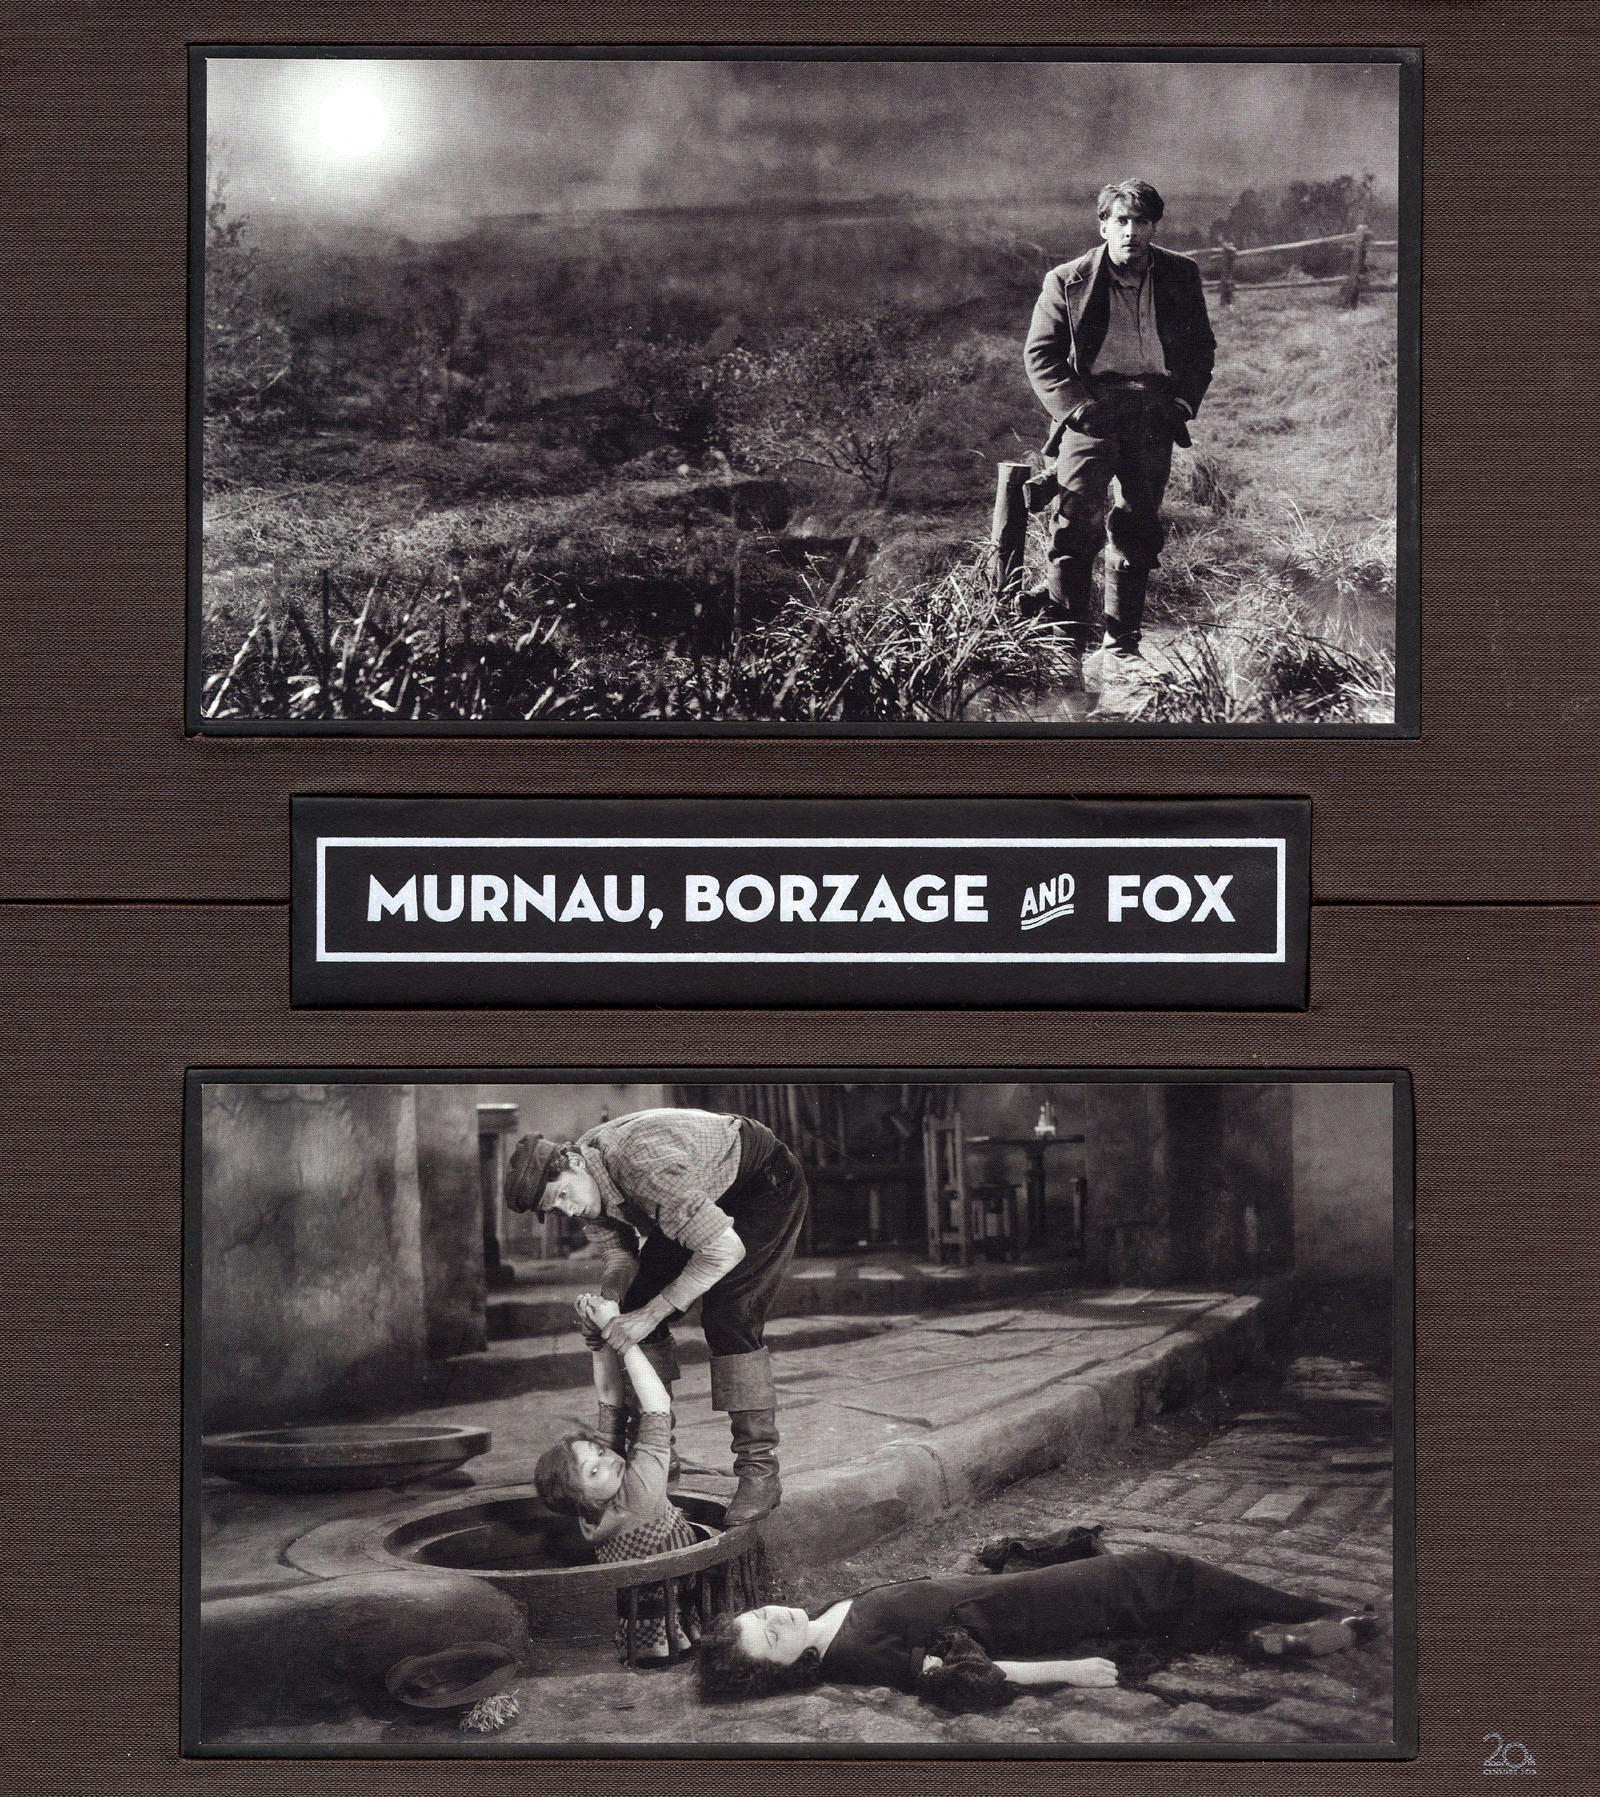 Murnau, Borzage and Fox